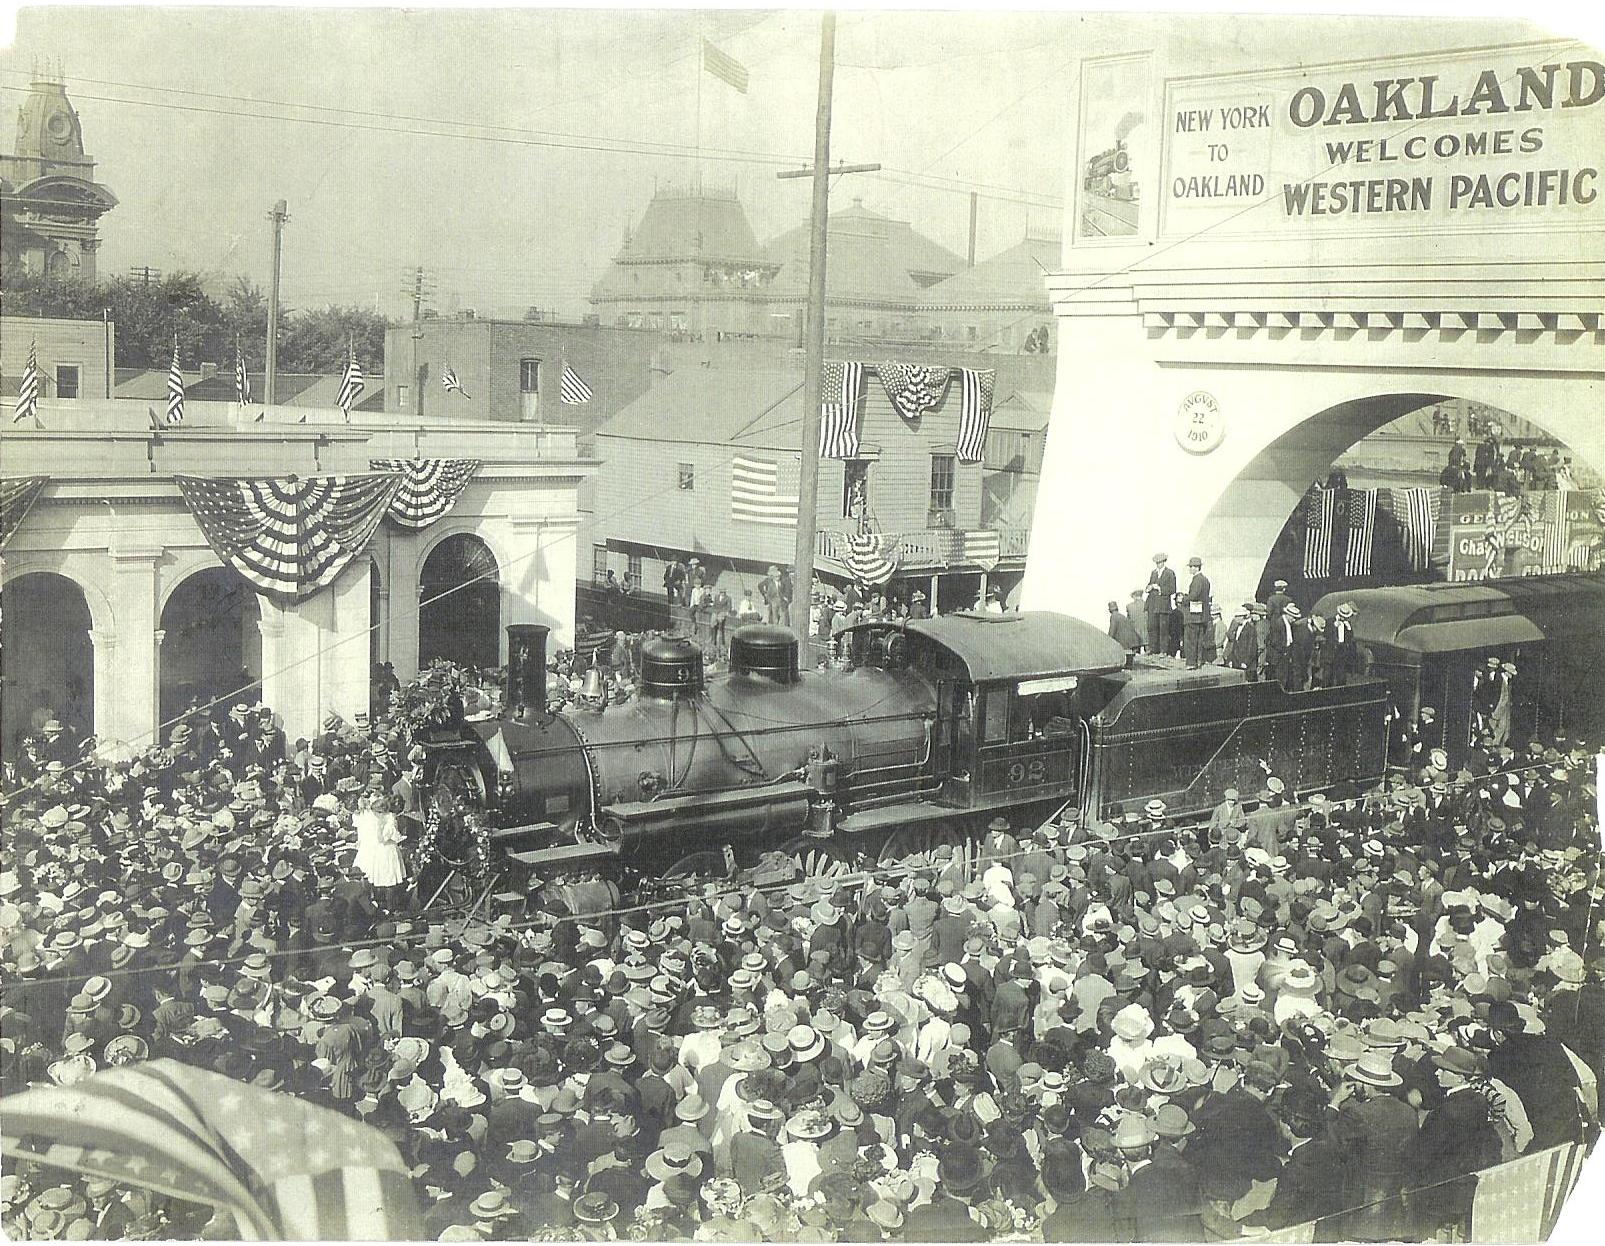 Western Pacific Depot Celebration, 1910